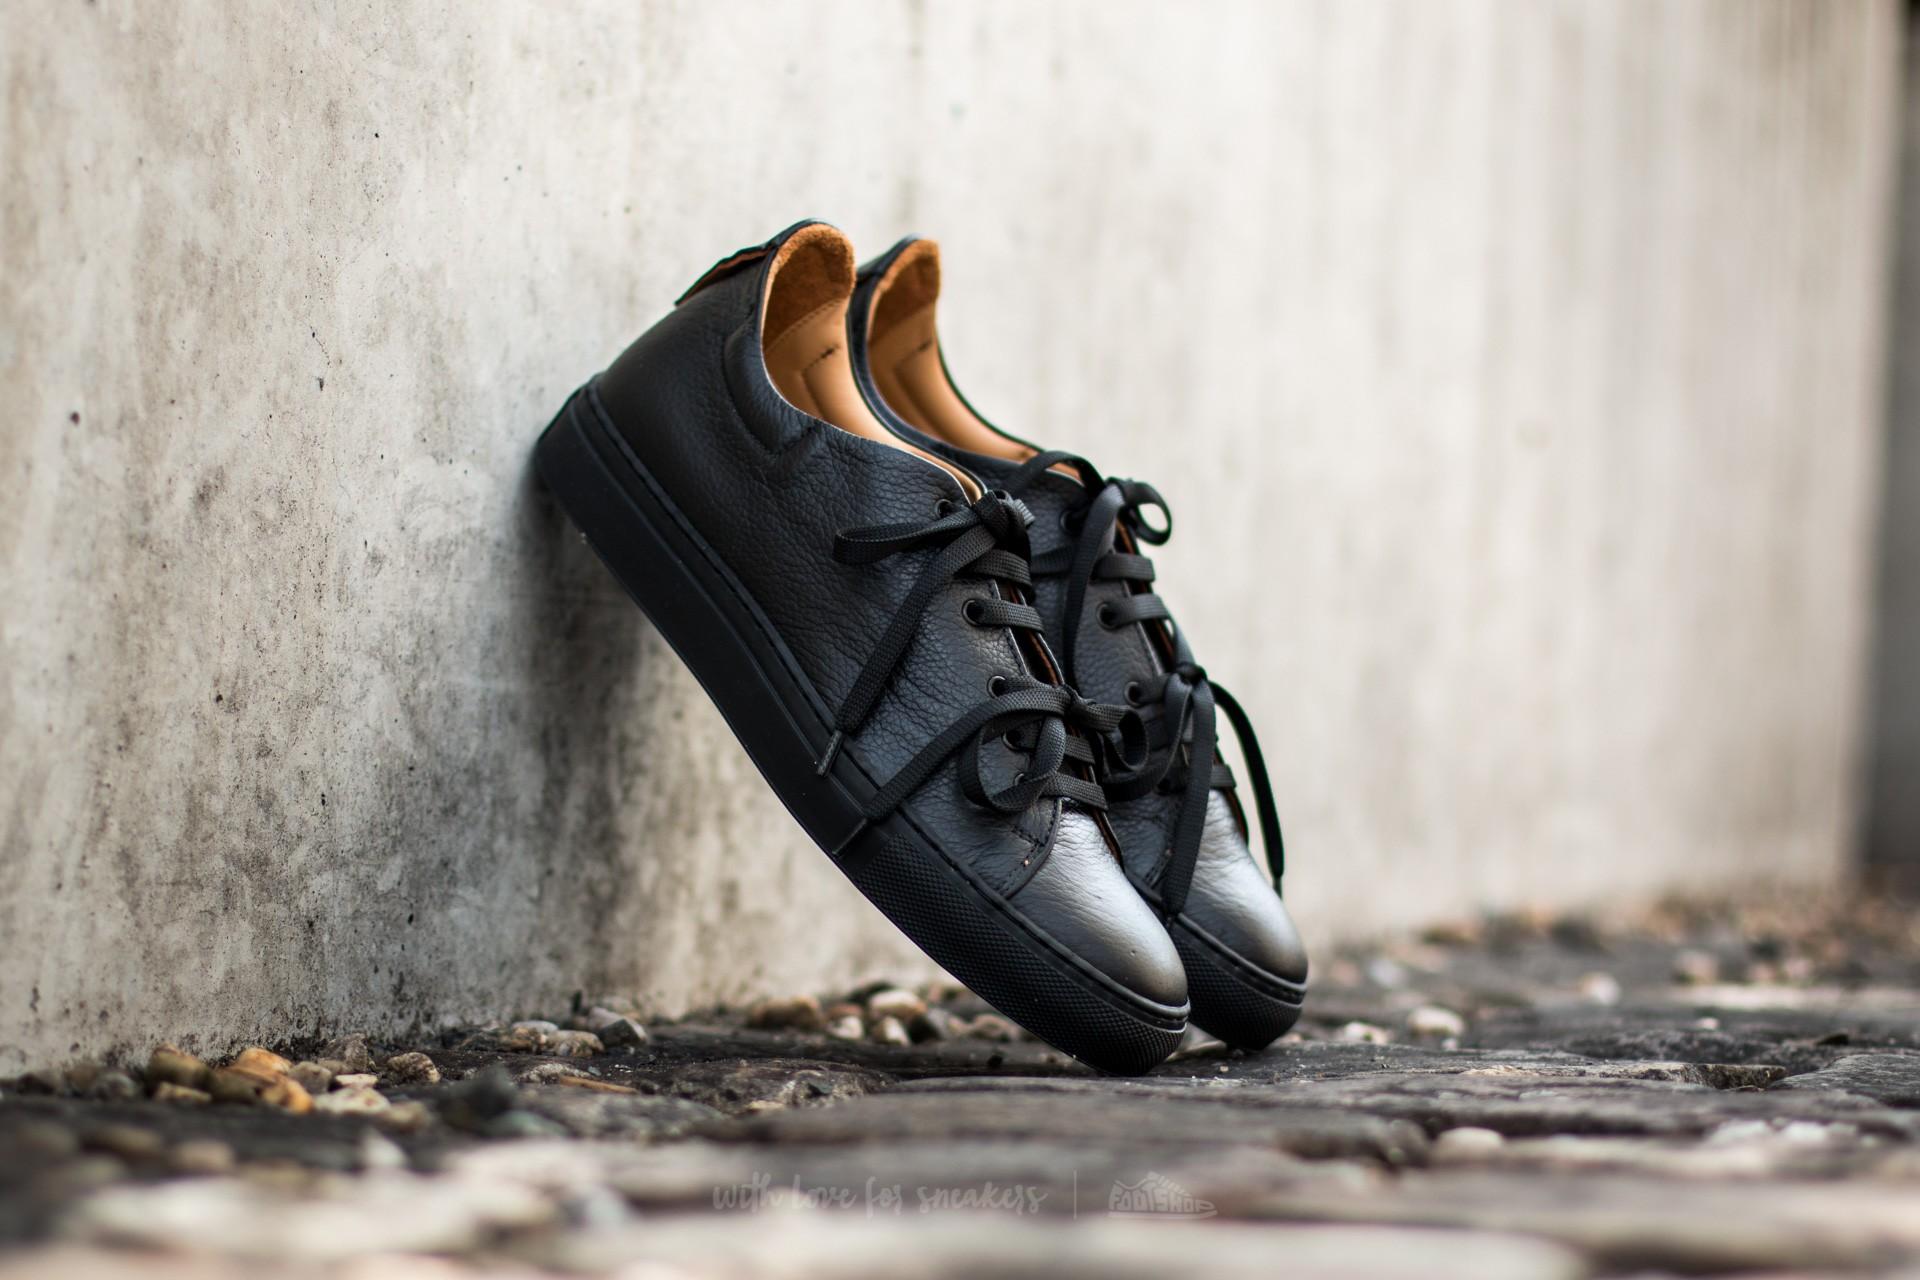 Marco Laganà Sneaker Leather Black-Black Sole